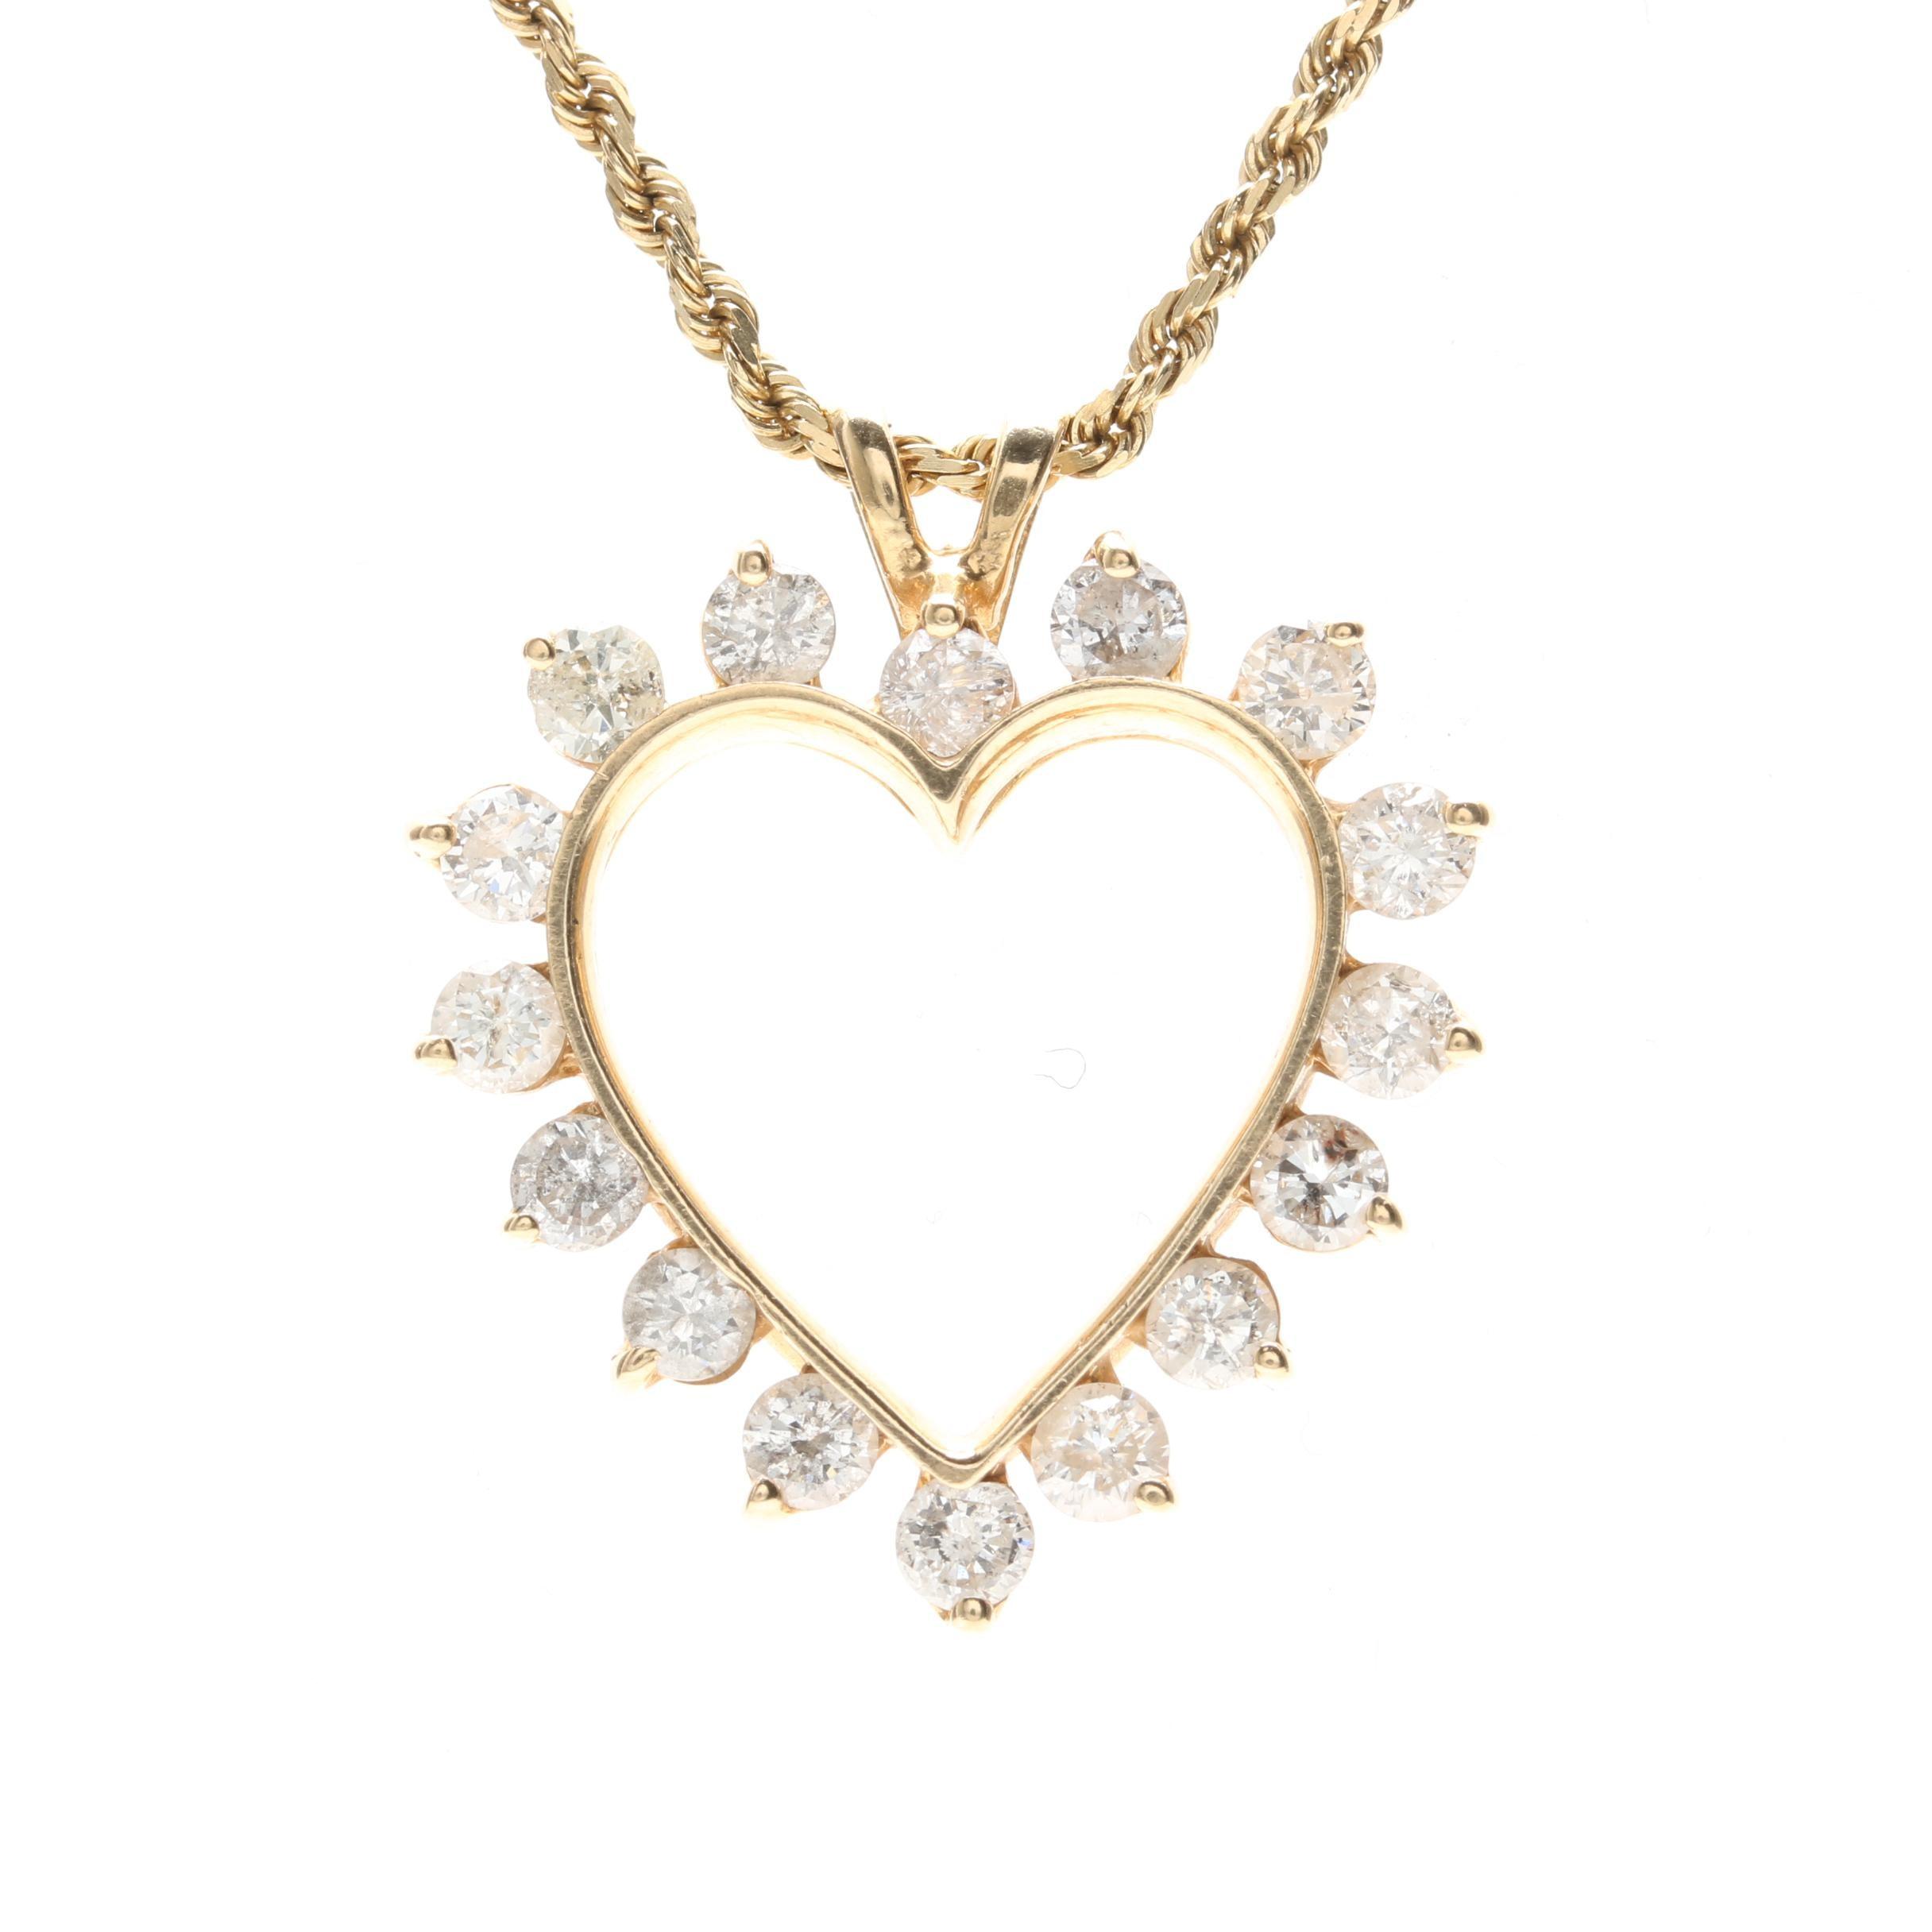 14K Yellow Gold 1.78 CTW Diamond Heart Necklace